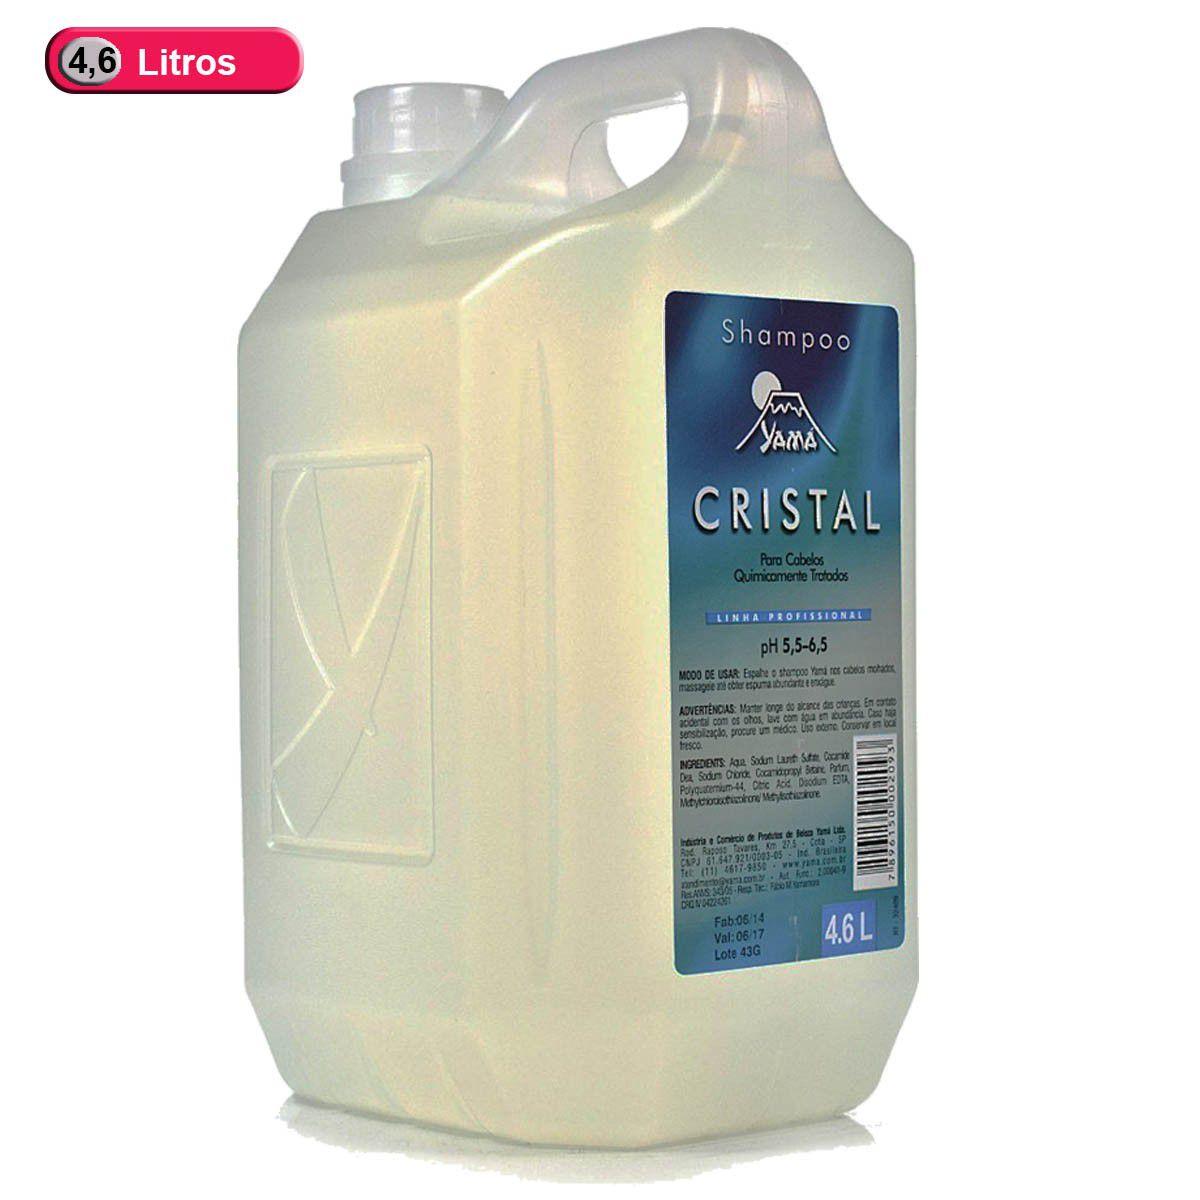 Galão Shampoo Cristal 4,6l Yamá Profissional